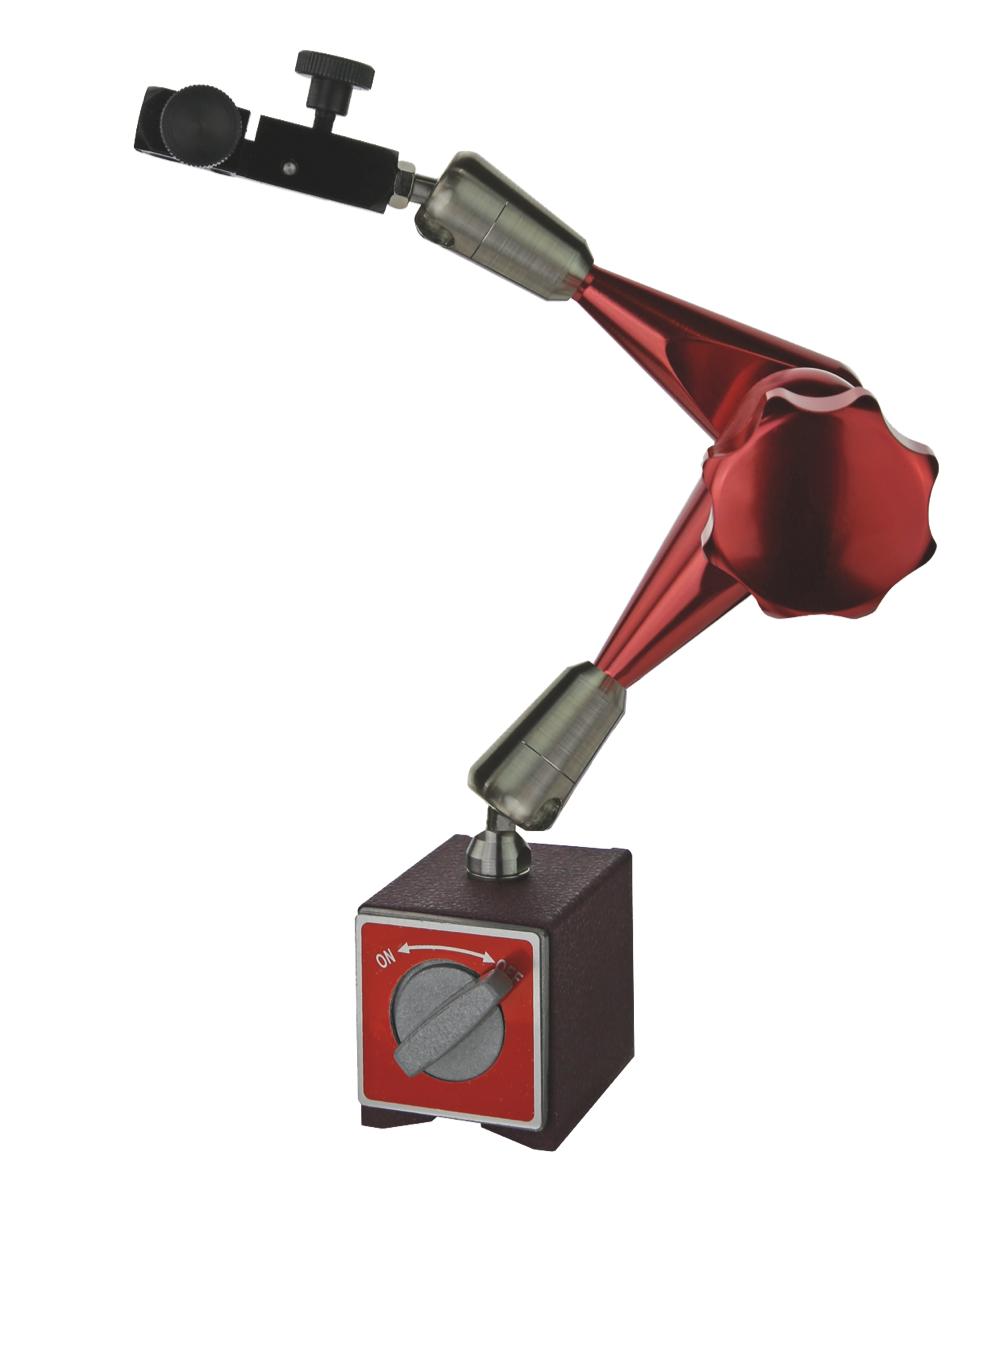 Magnet-Messstativ mit Zentralklemmung